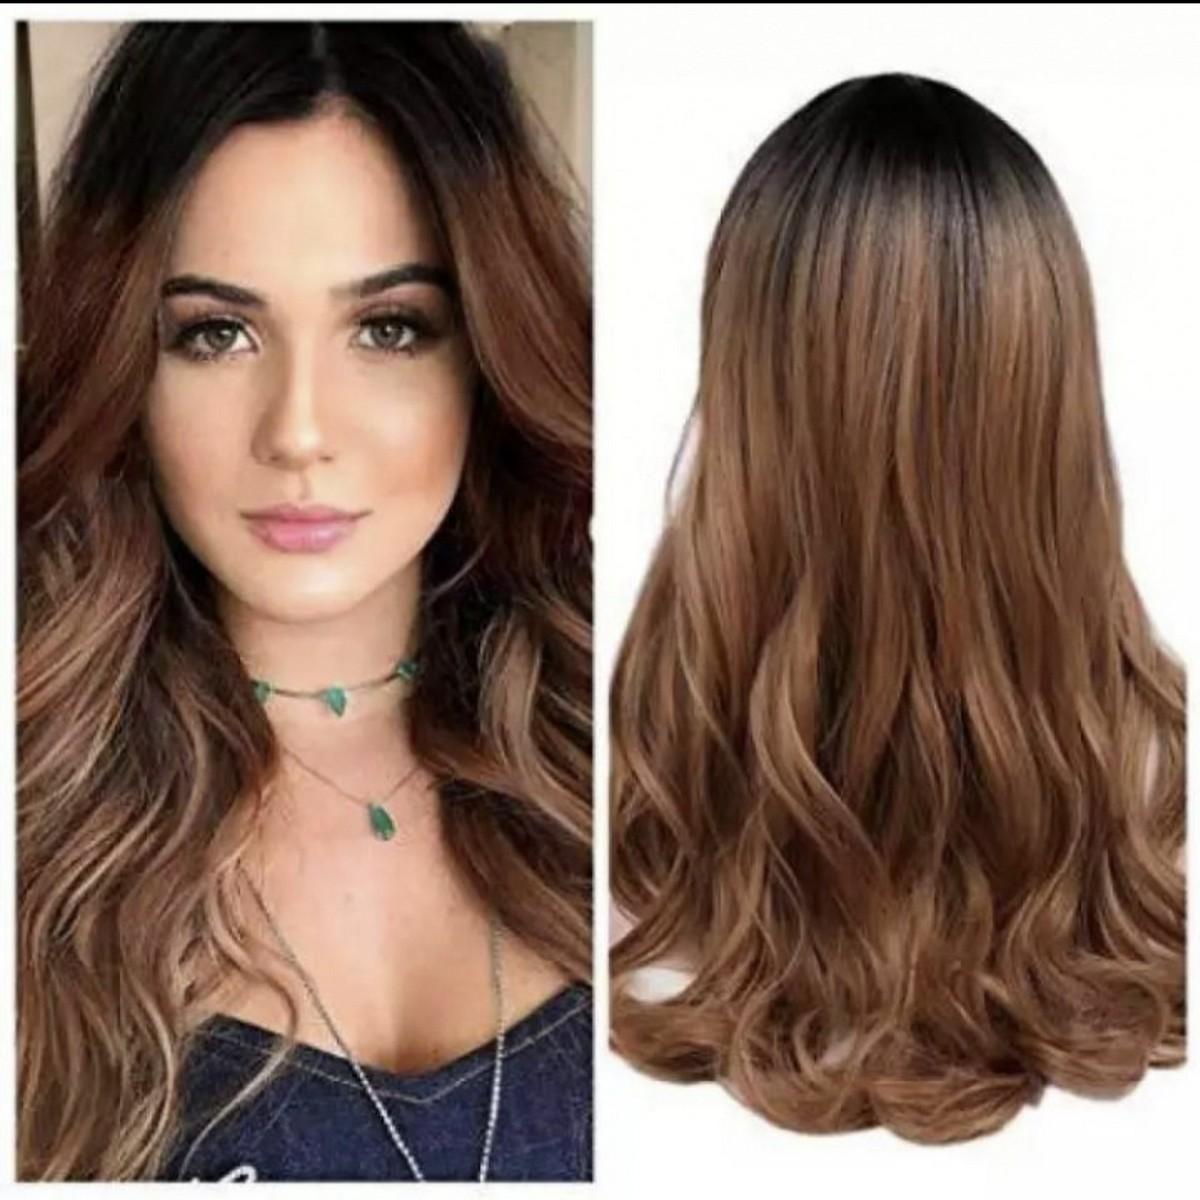 Hair Wig For Women Full HeaD Cap.Natural wigs